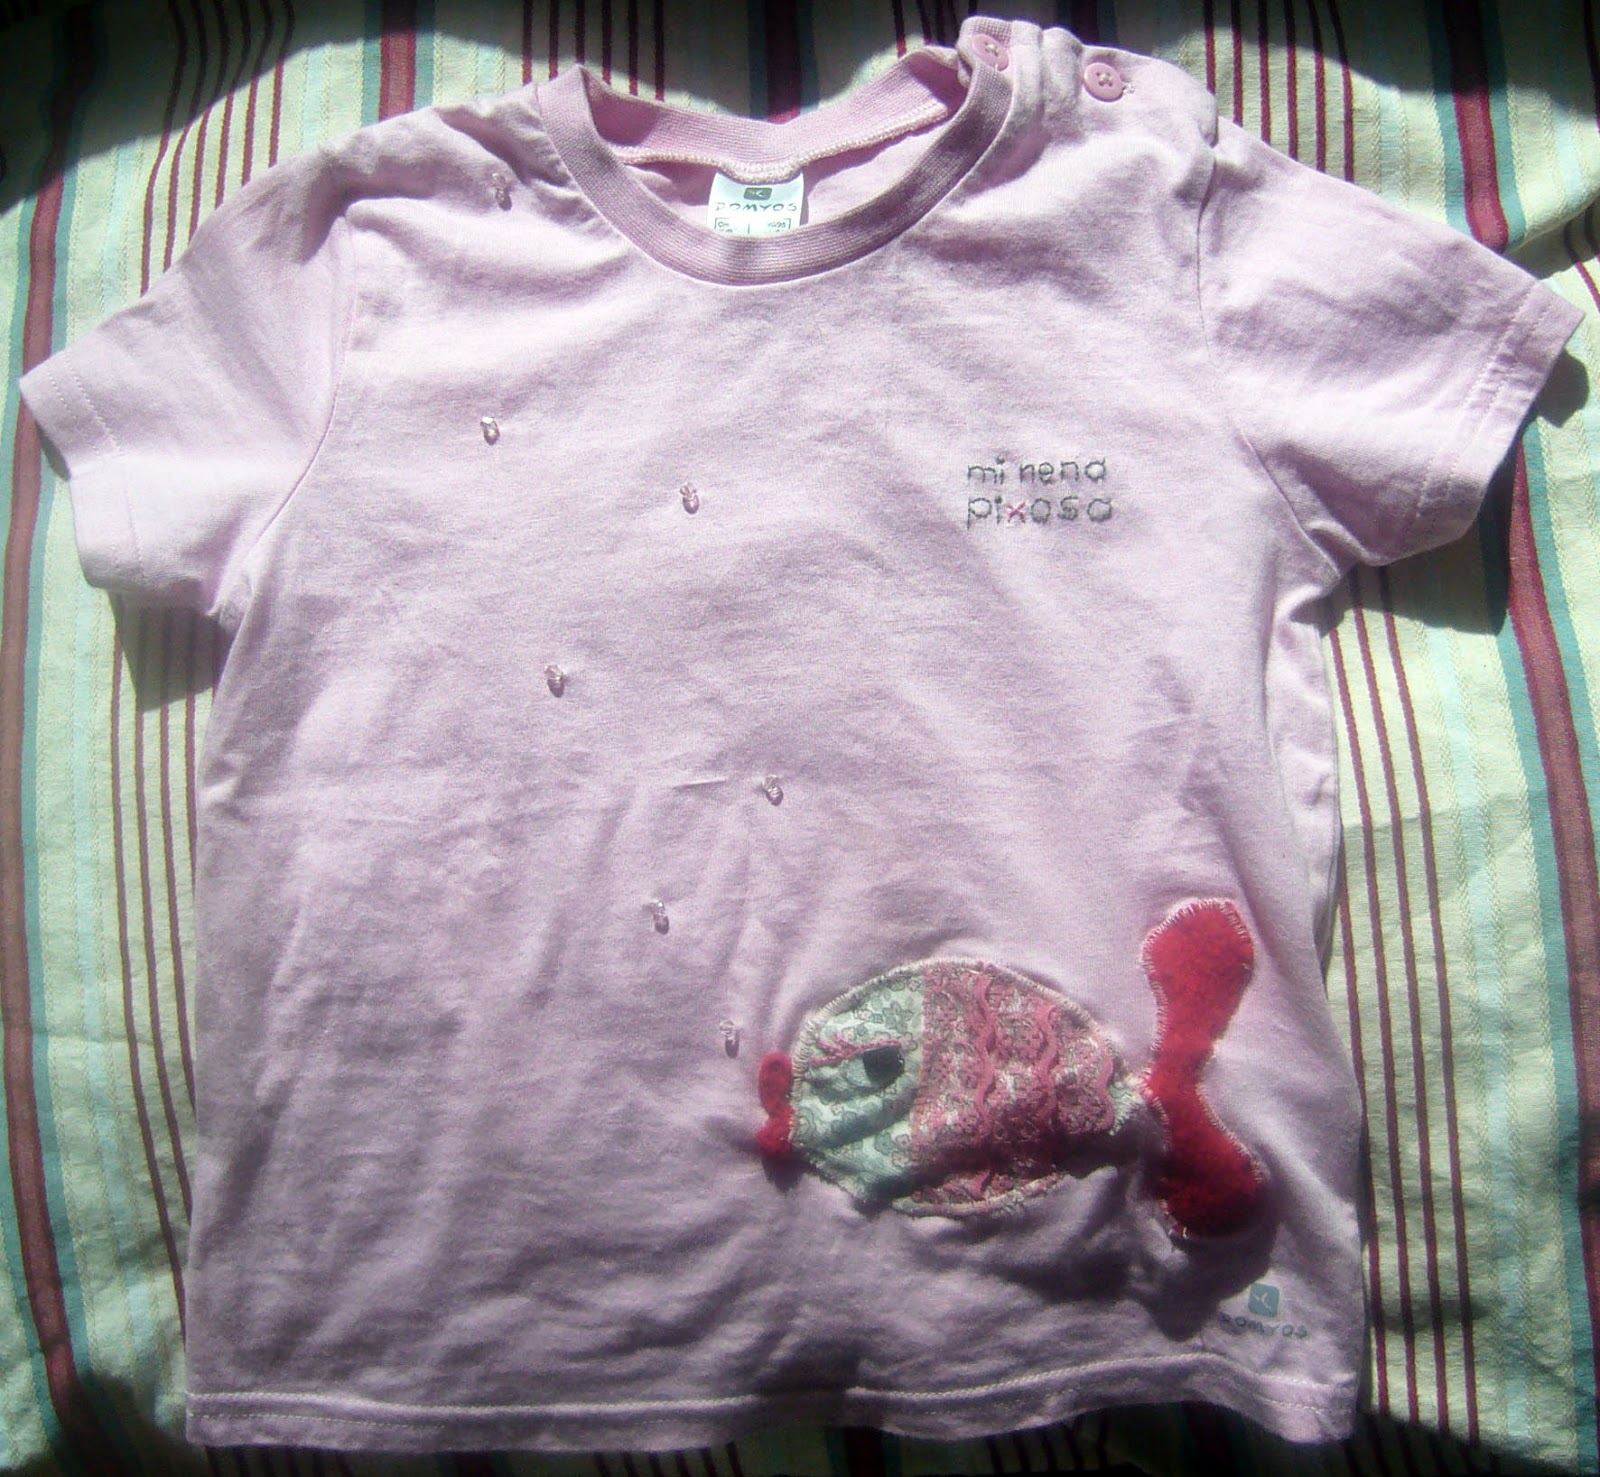 camiseta con pez burbujeante